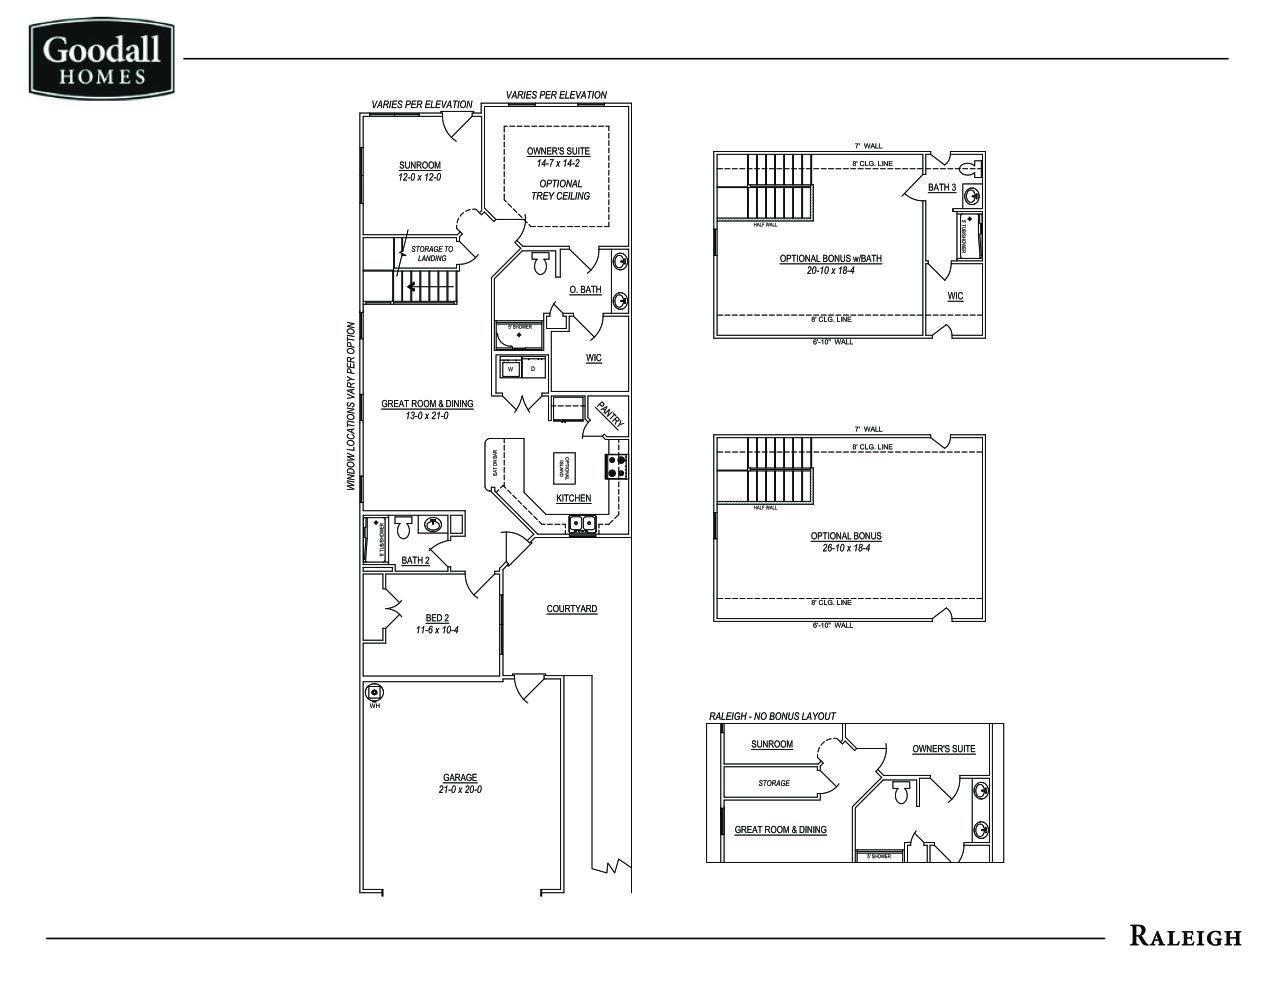 1648 Foston Lane, Gallatin, TN 37066 - MLS#: 2217060